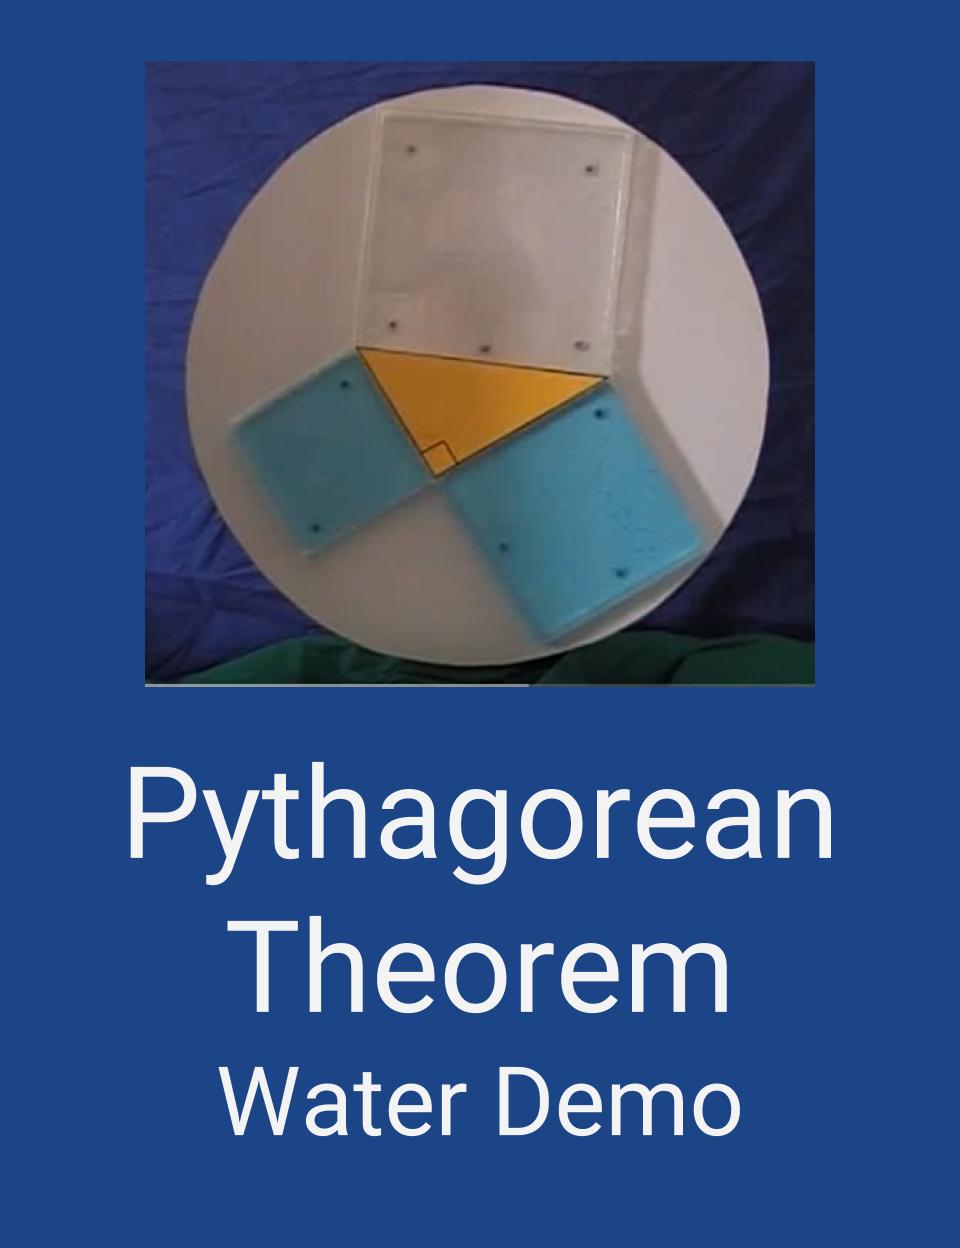 Pythagorean Theorem Water Demo Video Cultofpedagogypin Pythagorean Theorem Algebra Activities Pythagorean Theorem Activity